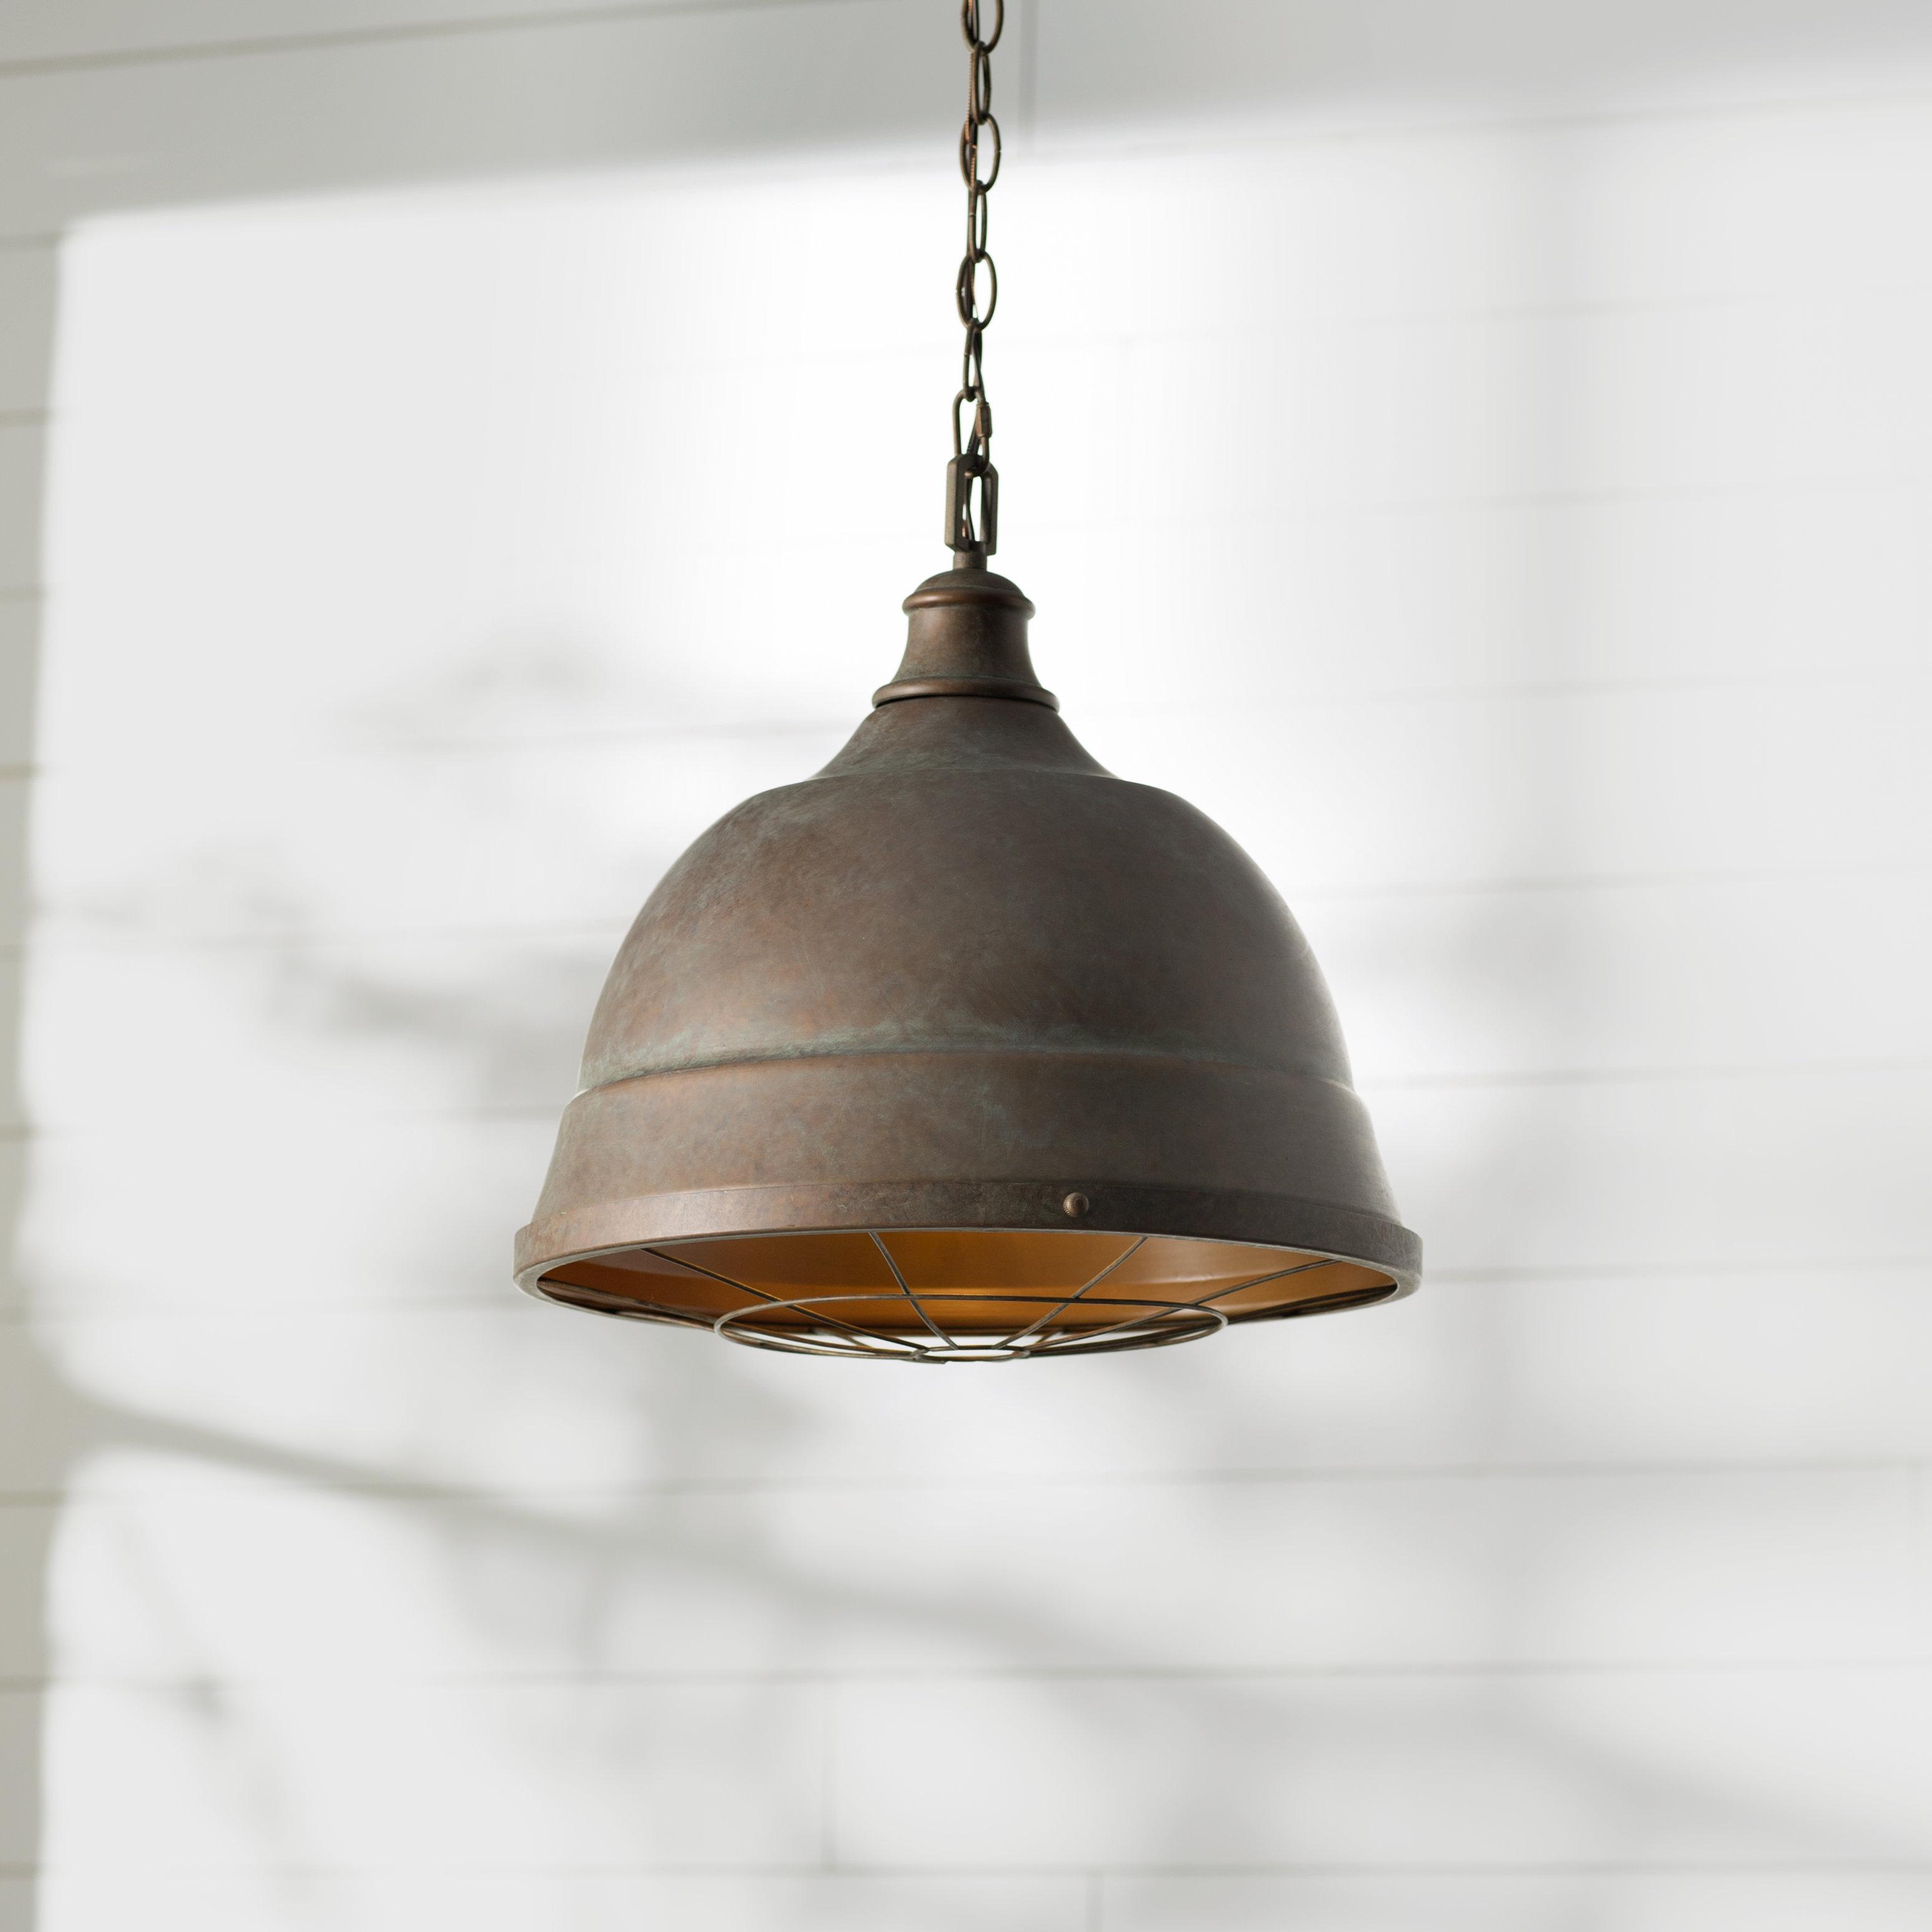 Recent Elinna 2 Light Single Bell Pendant Regarding Proctor 1 Light Bowl Pendants (Gallery 13 of 20)